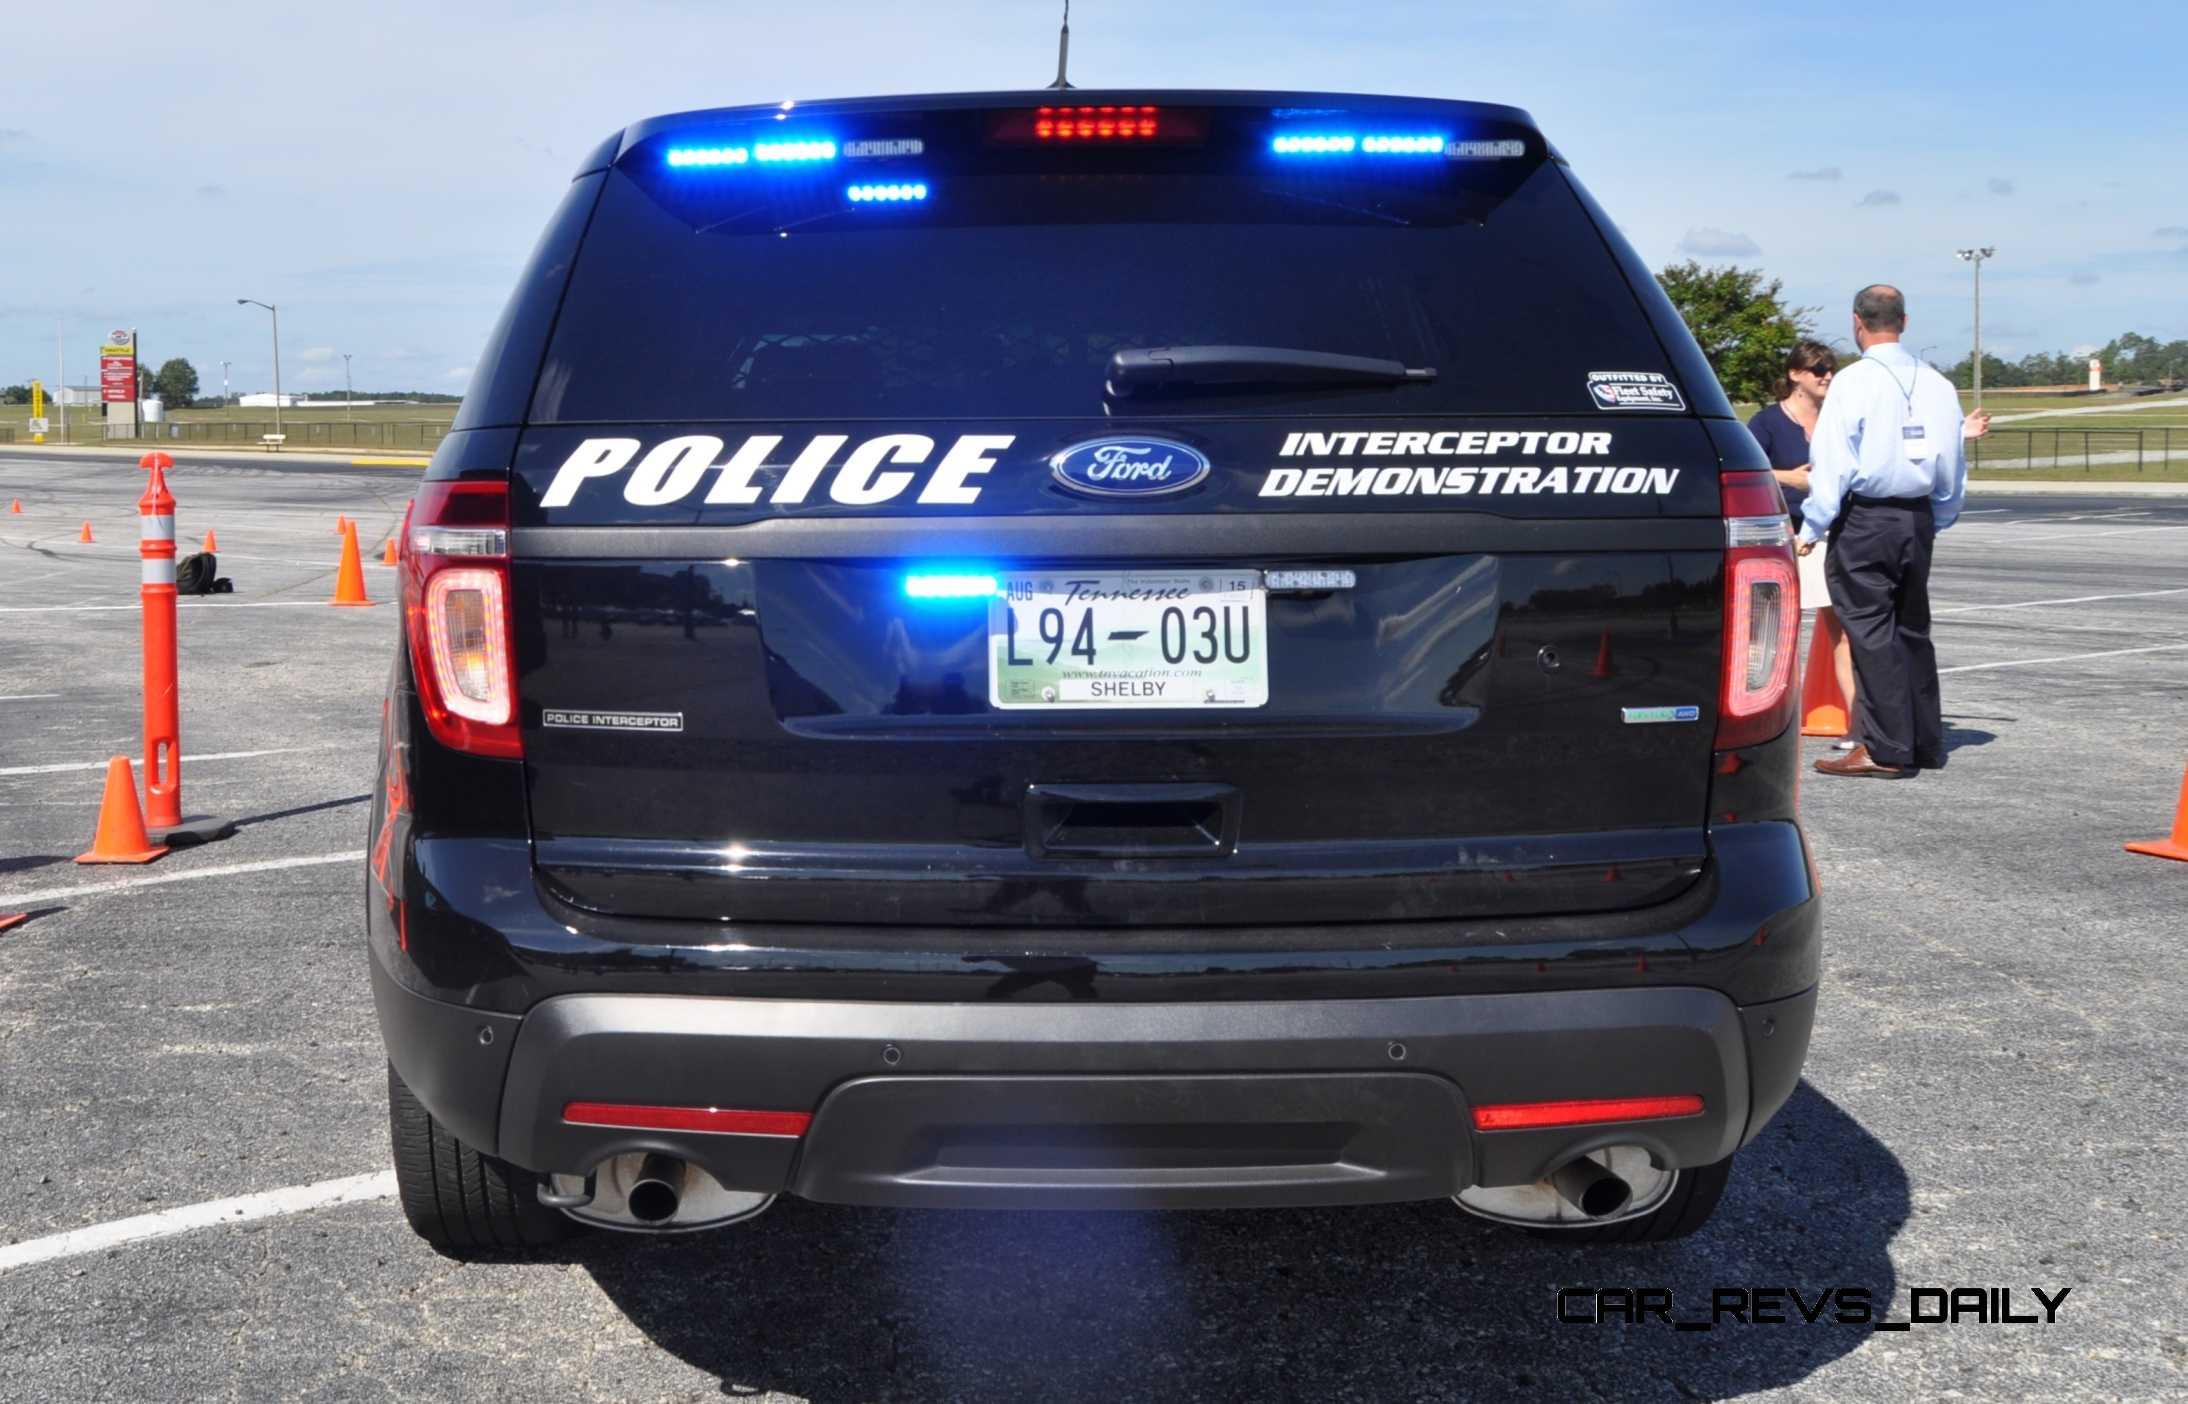 Roof Rack Nissan Juke 2015 Ford Interceptor Utility Review